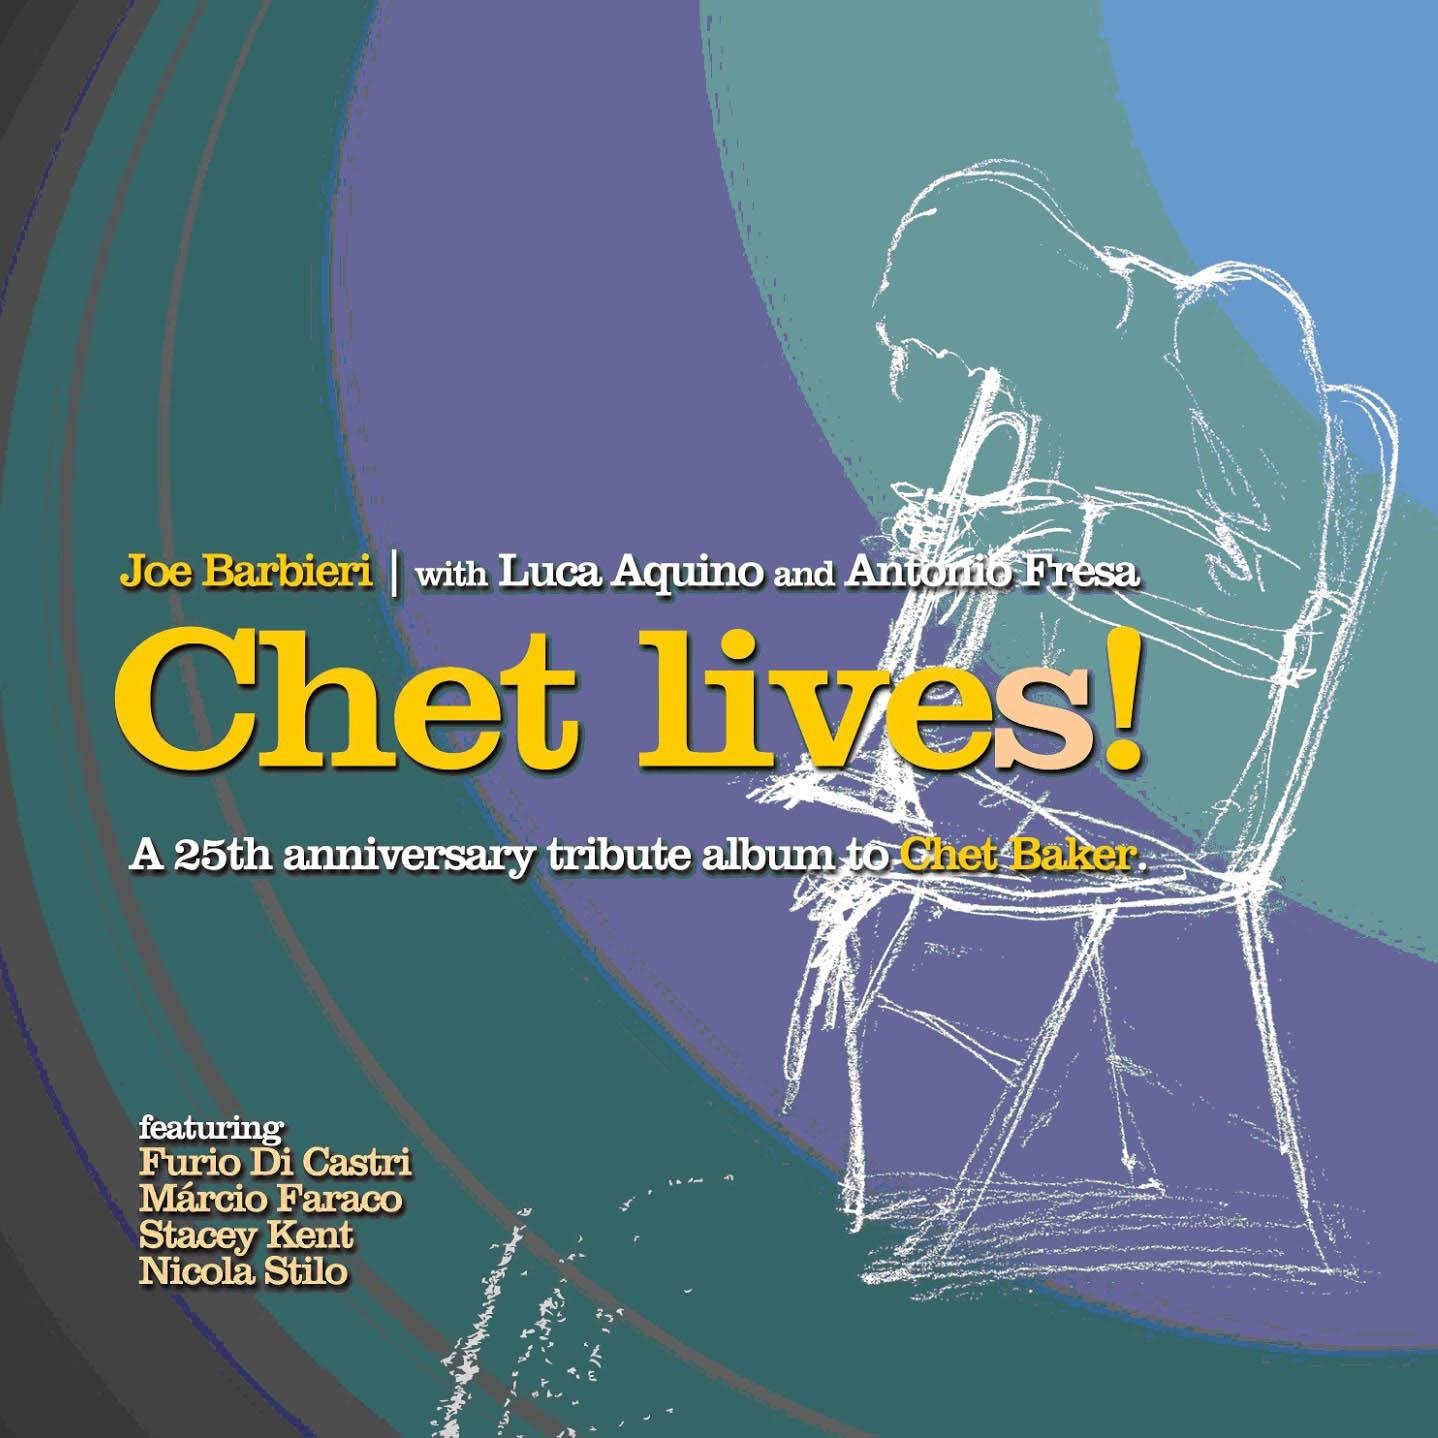 Copertina Disco Vinile 33 giri Chet Lives! di Joe Barbieri